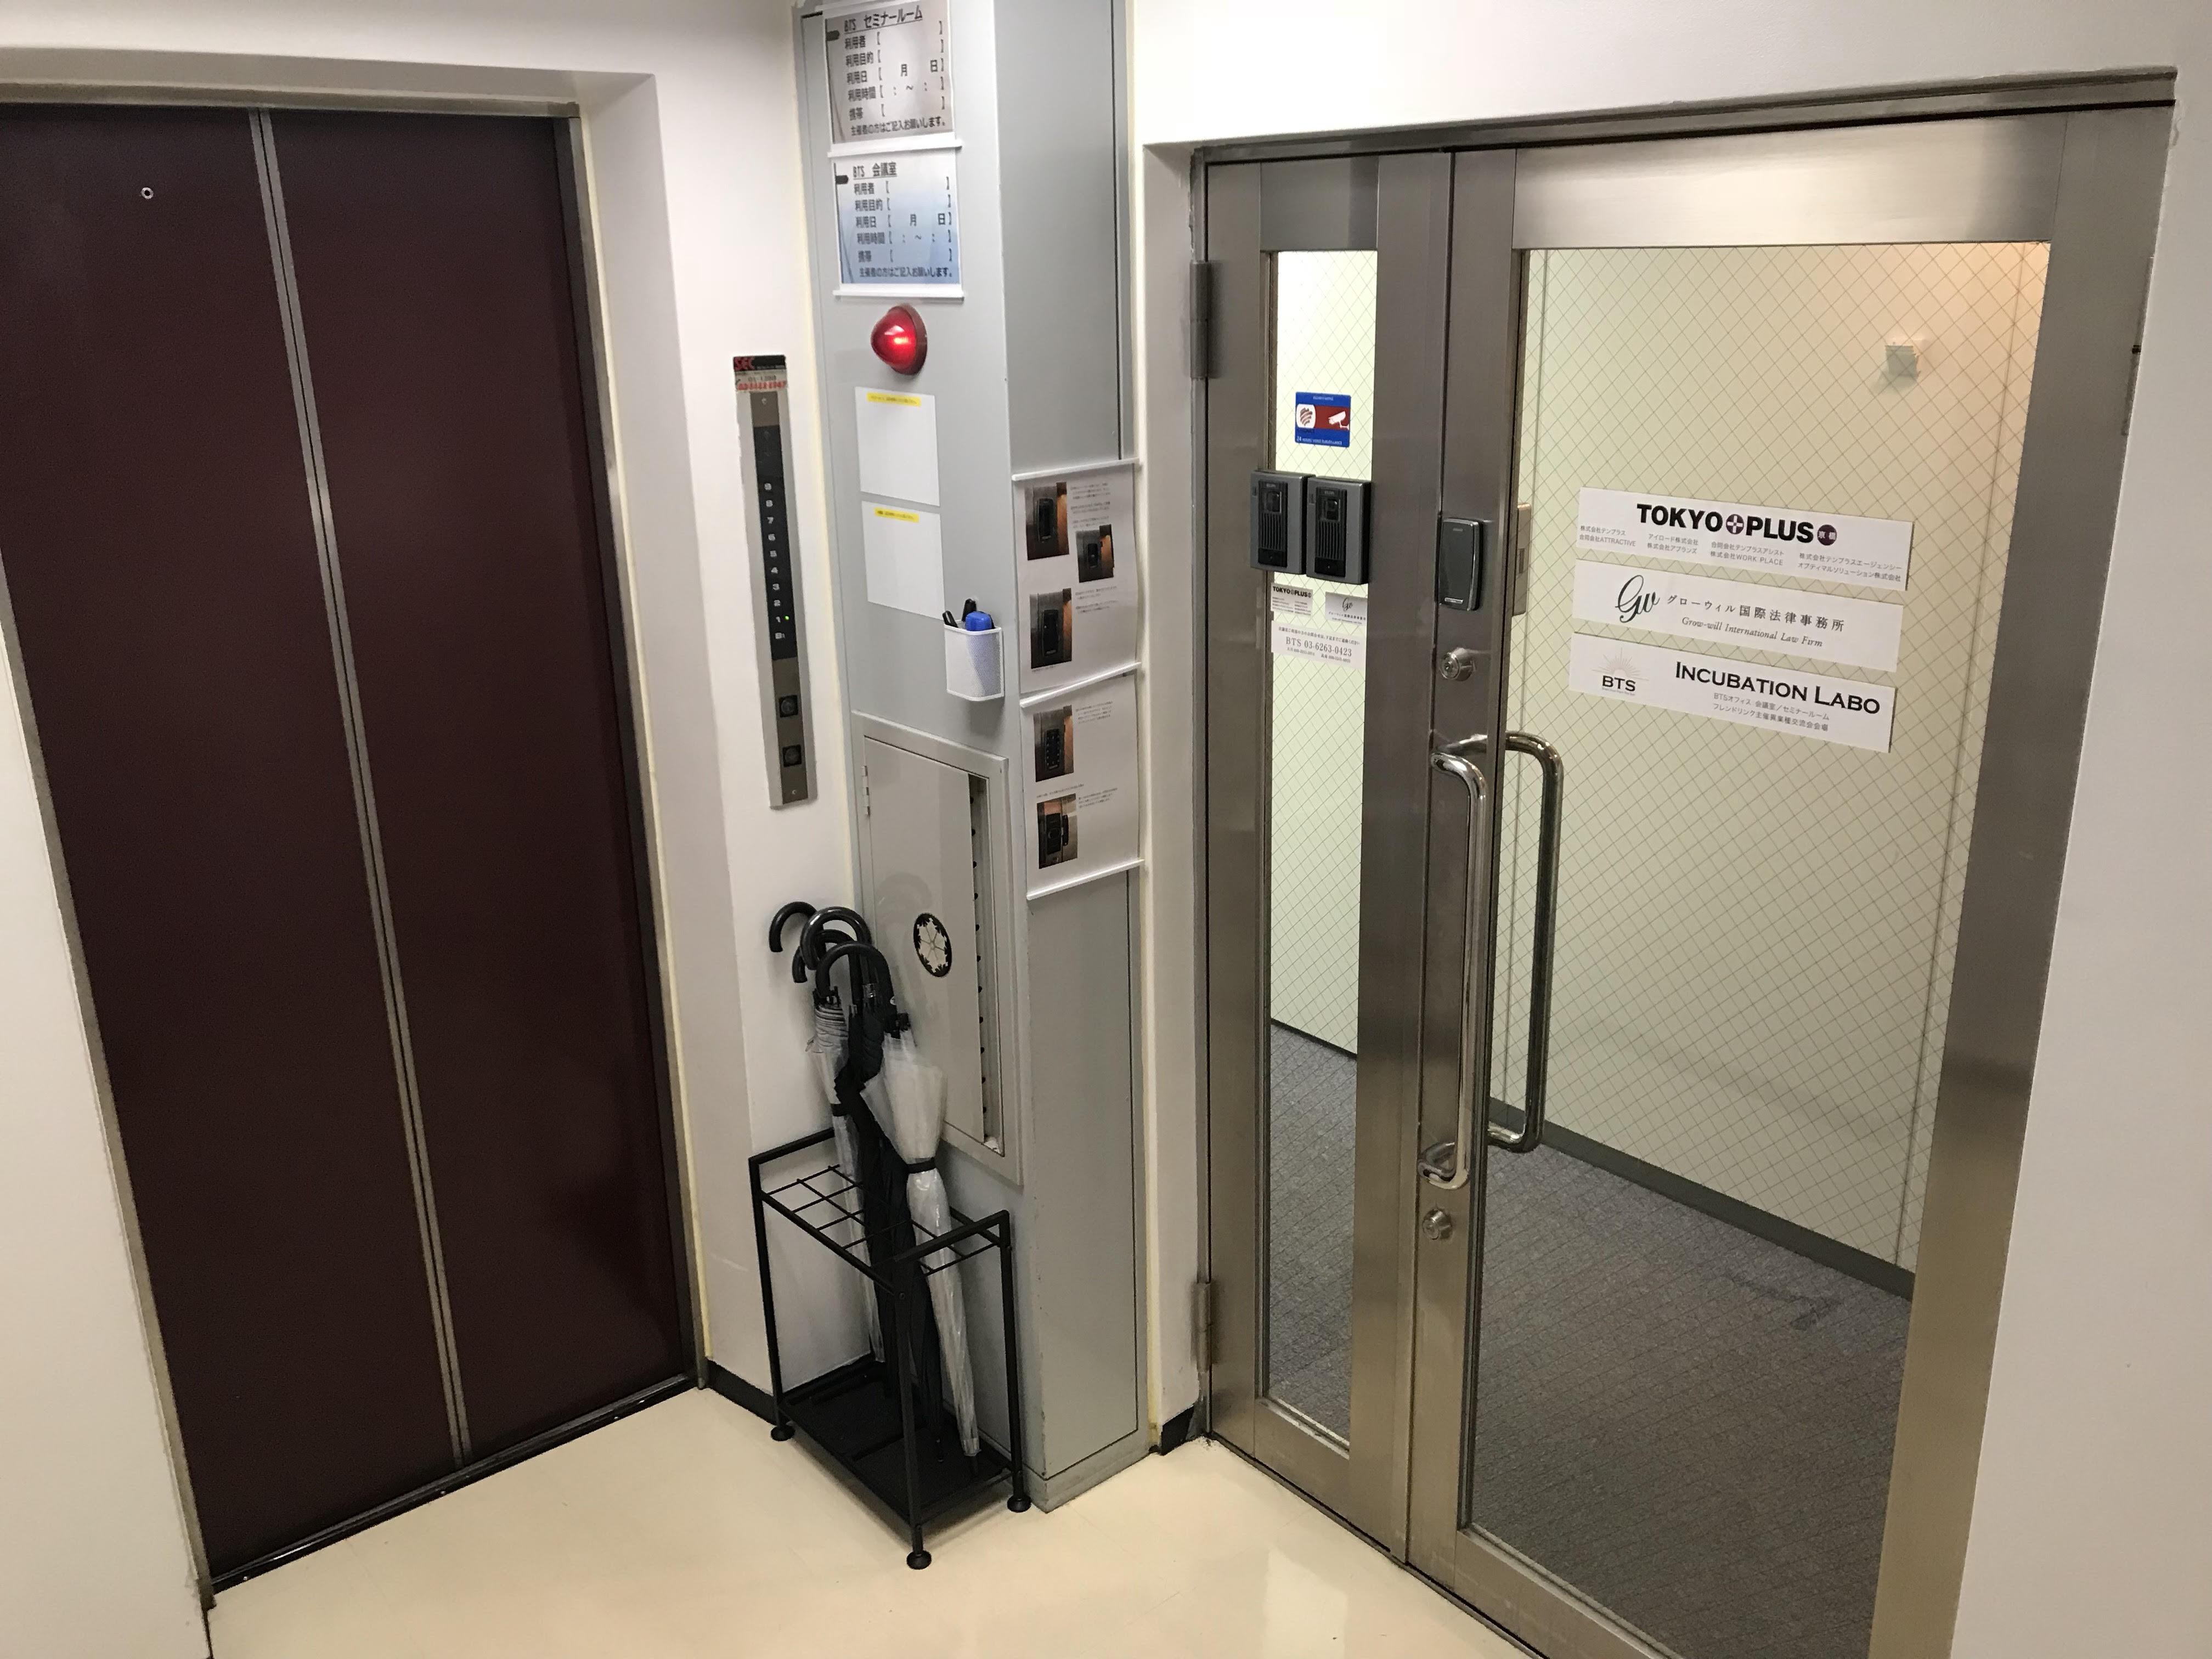 BTSオフィス 7階 テレワークスペース7-9の入口の写真